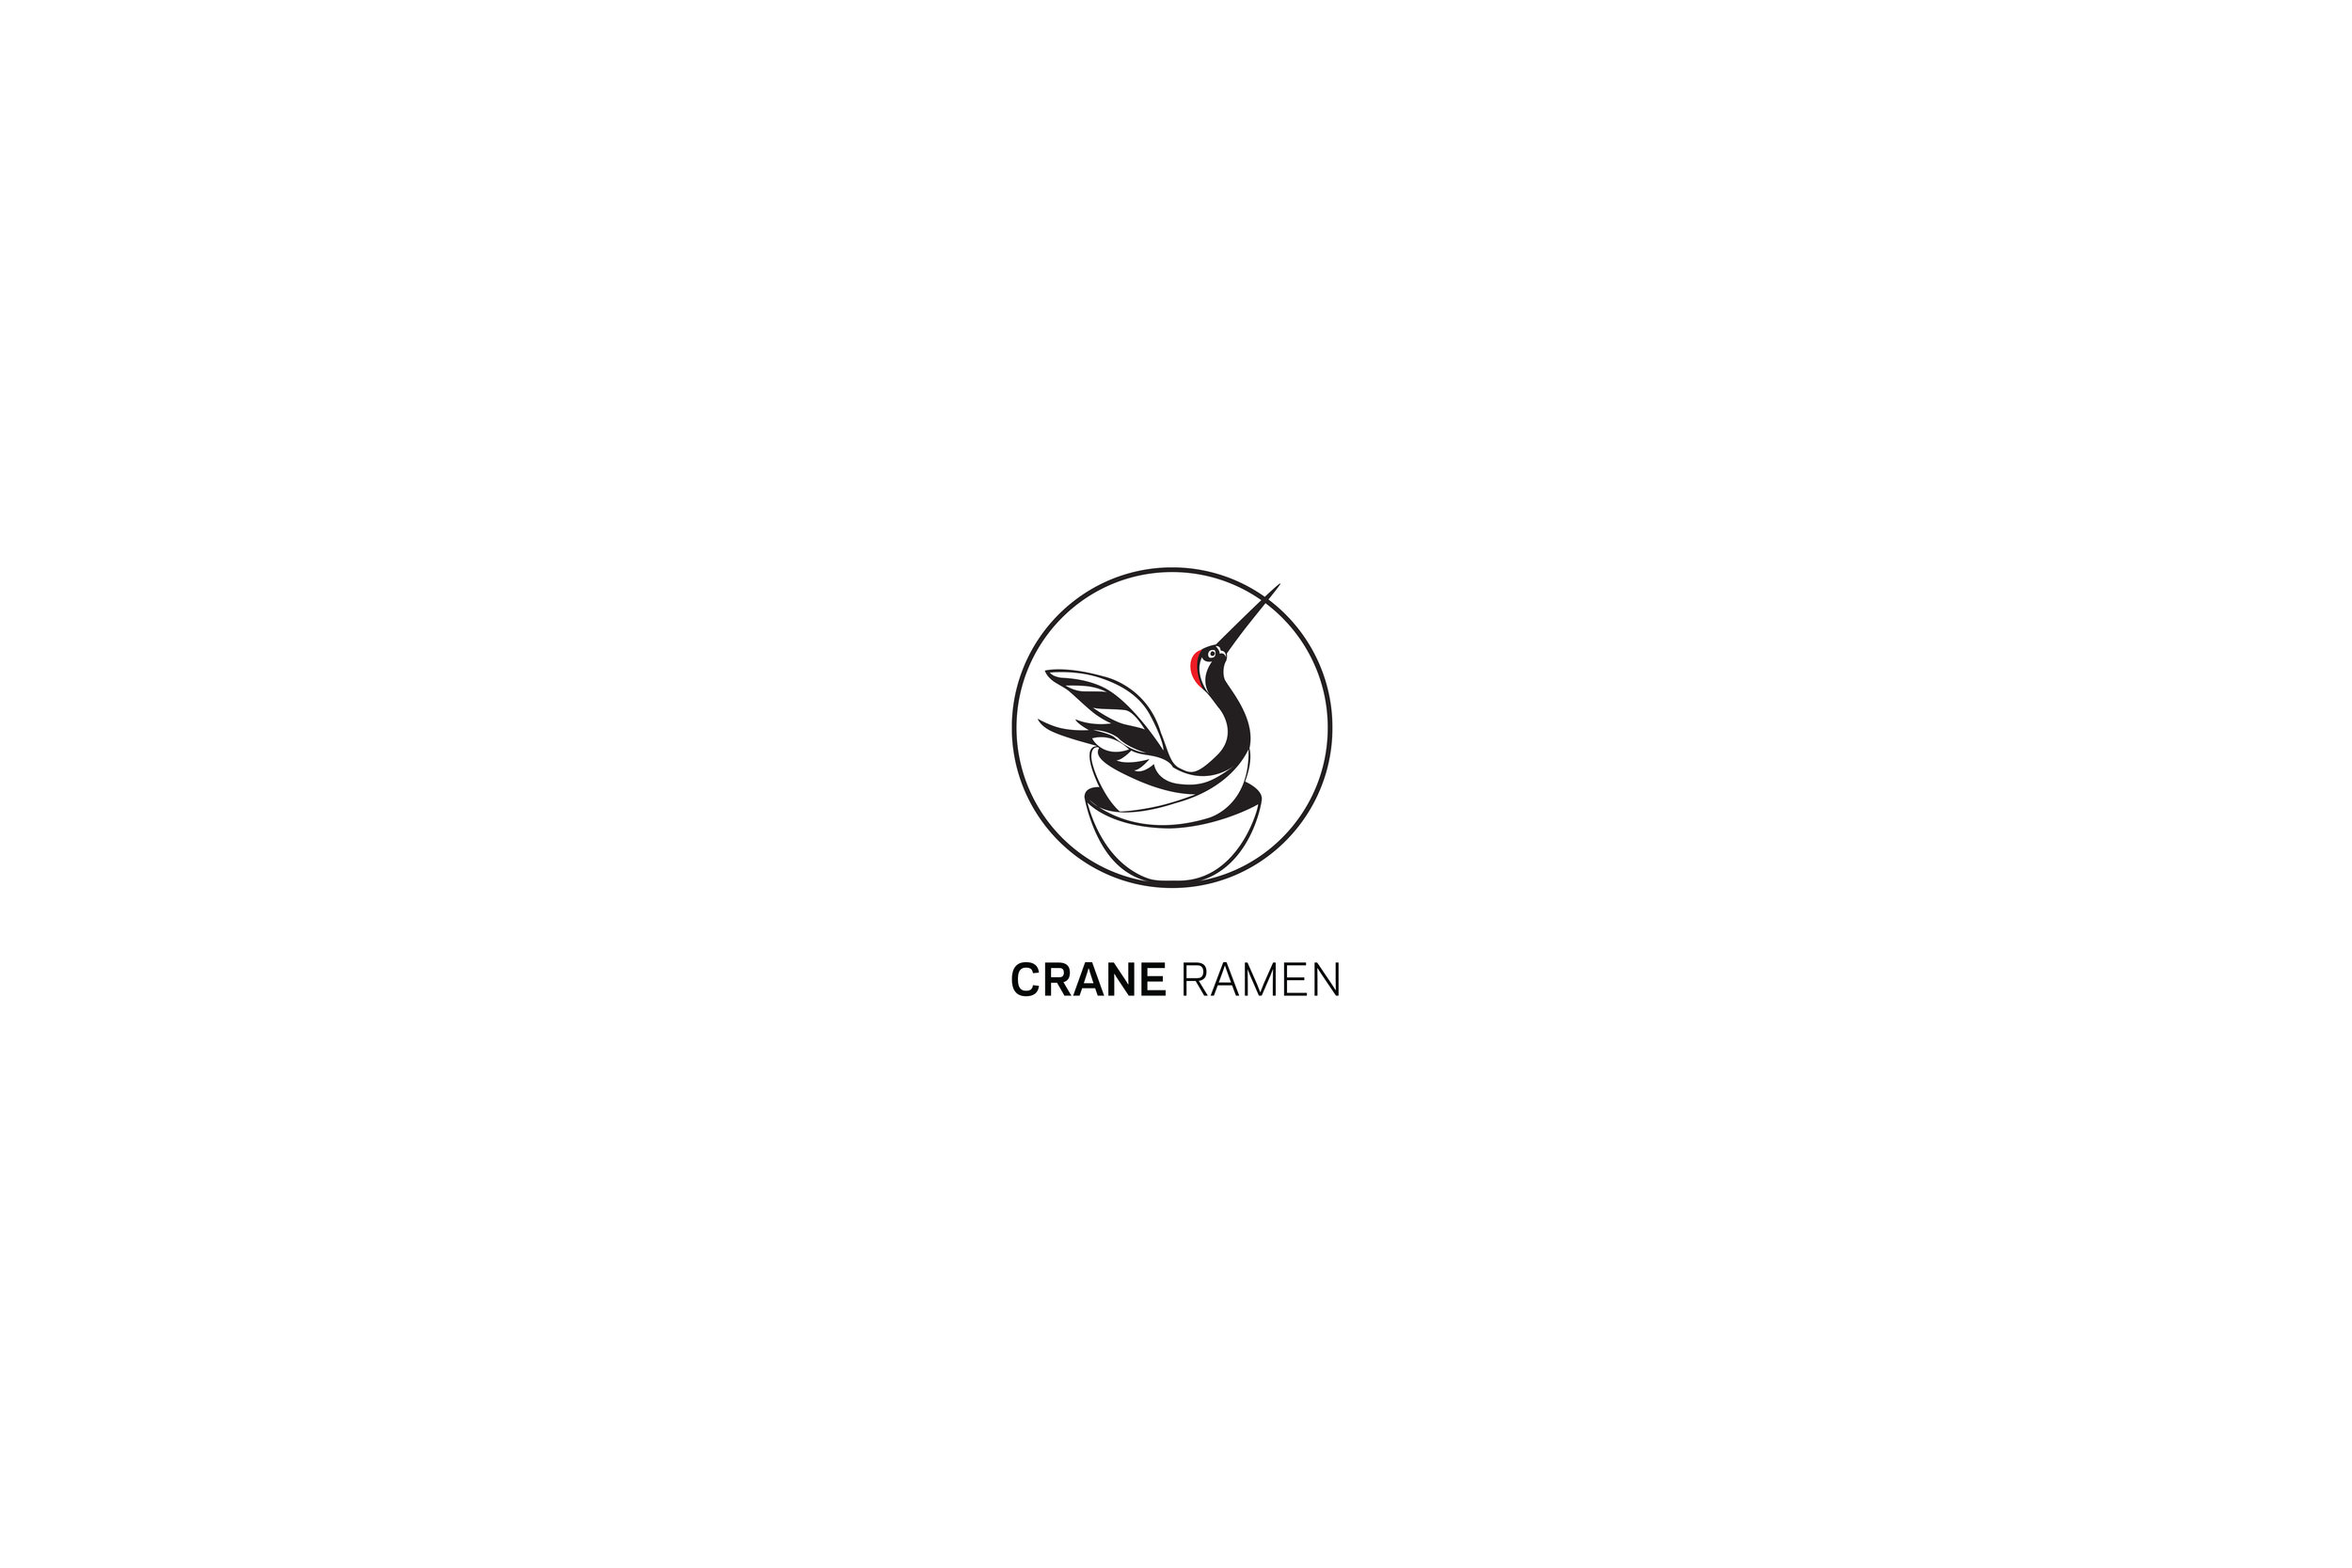 Crane Ramen, Gainssville, Florida